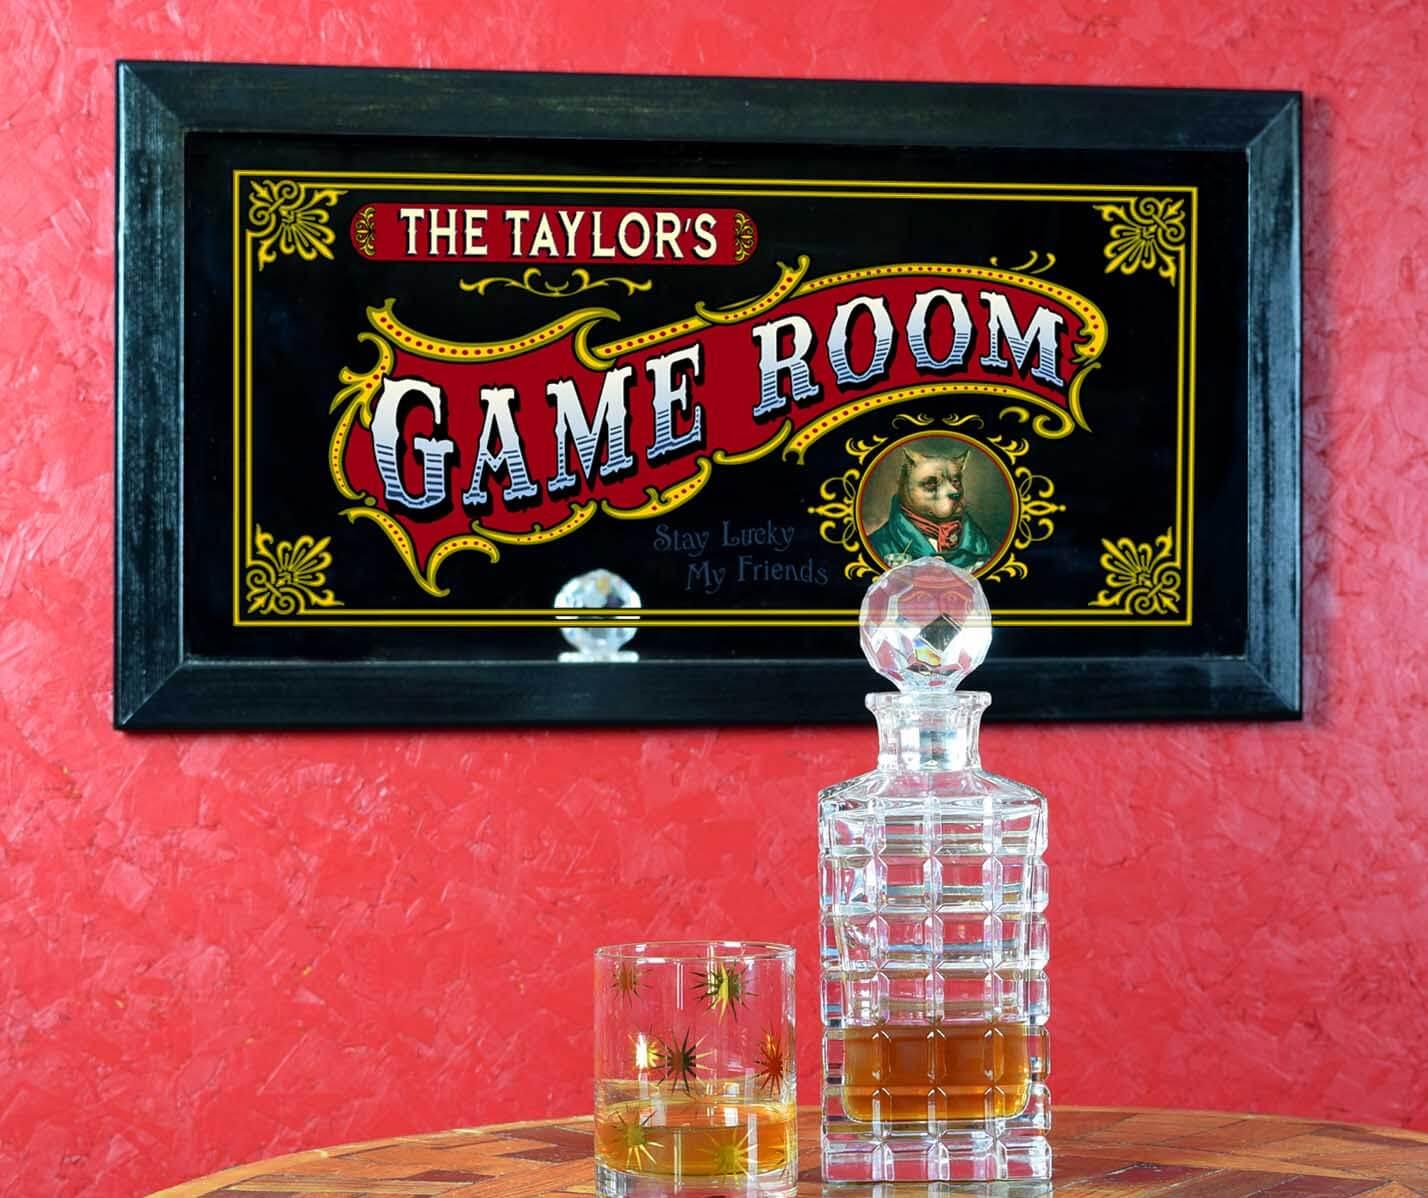 Mirror Bar Man Cave Signs 2 Mir 06 Gameroom